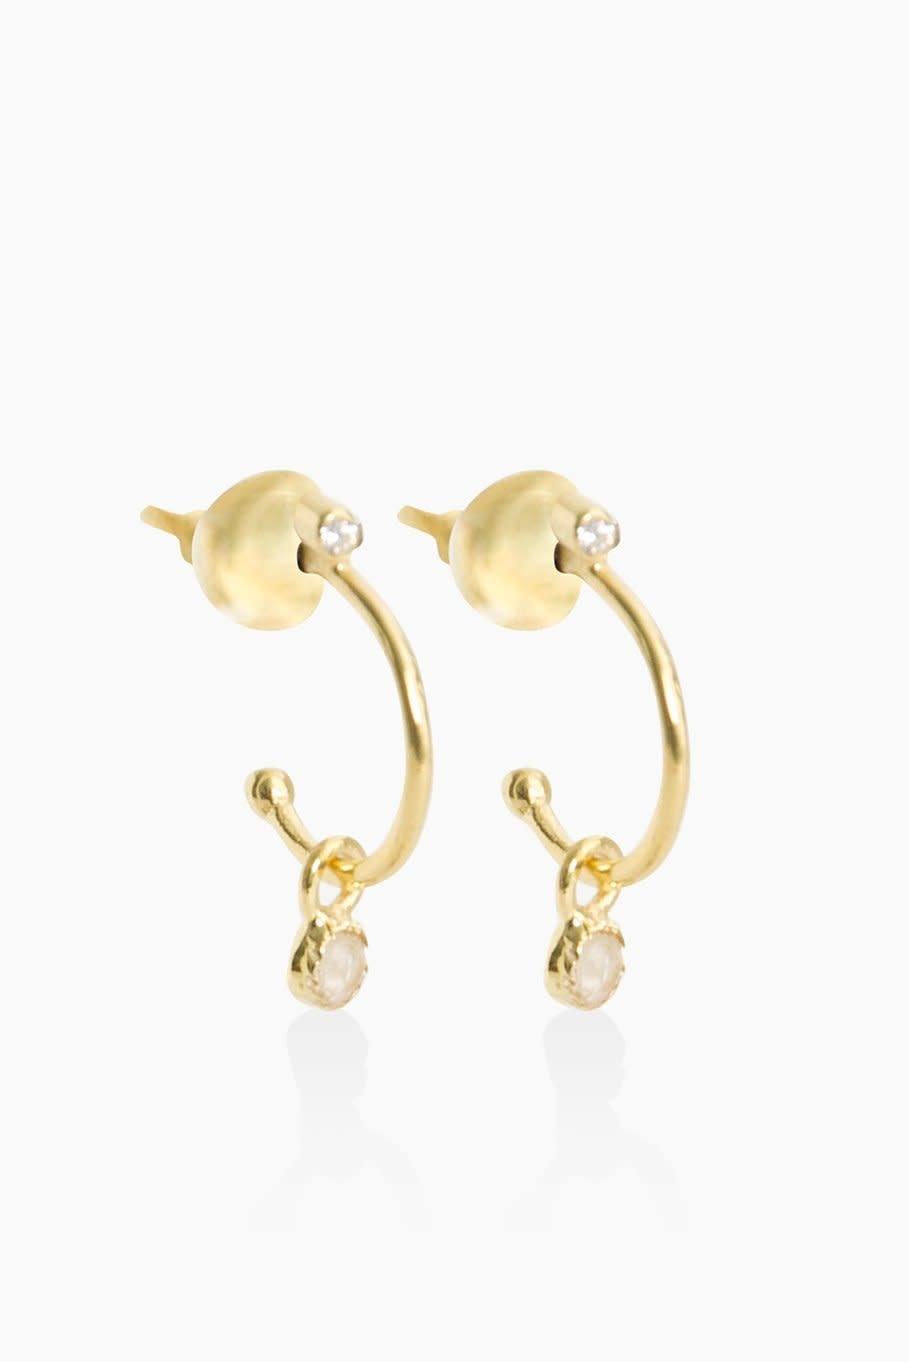 Détail Earrings Henriette moonstone gold plated (8822)